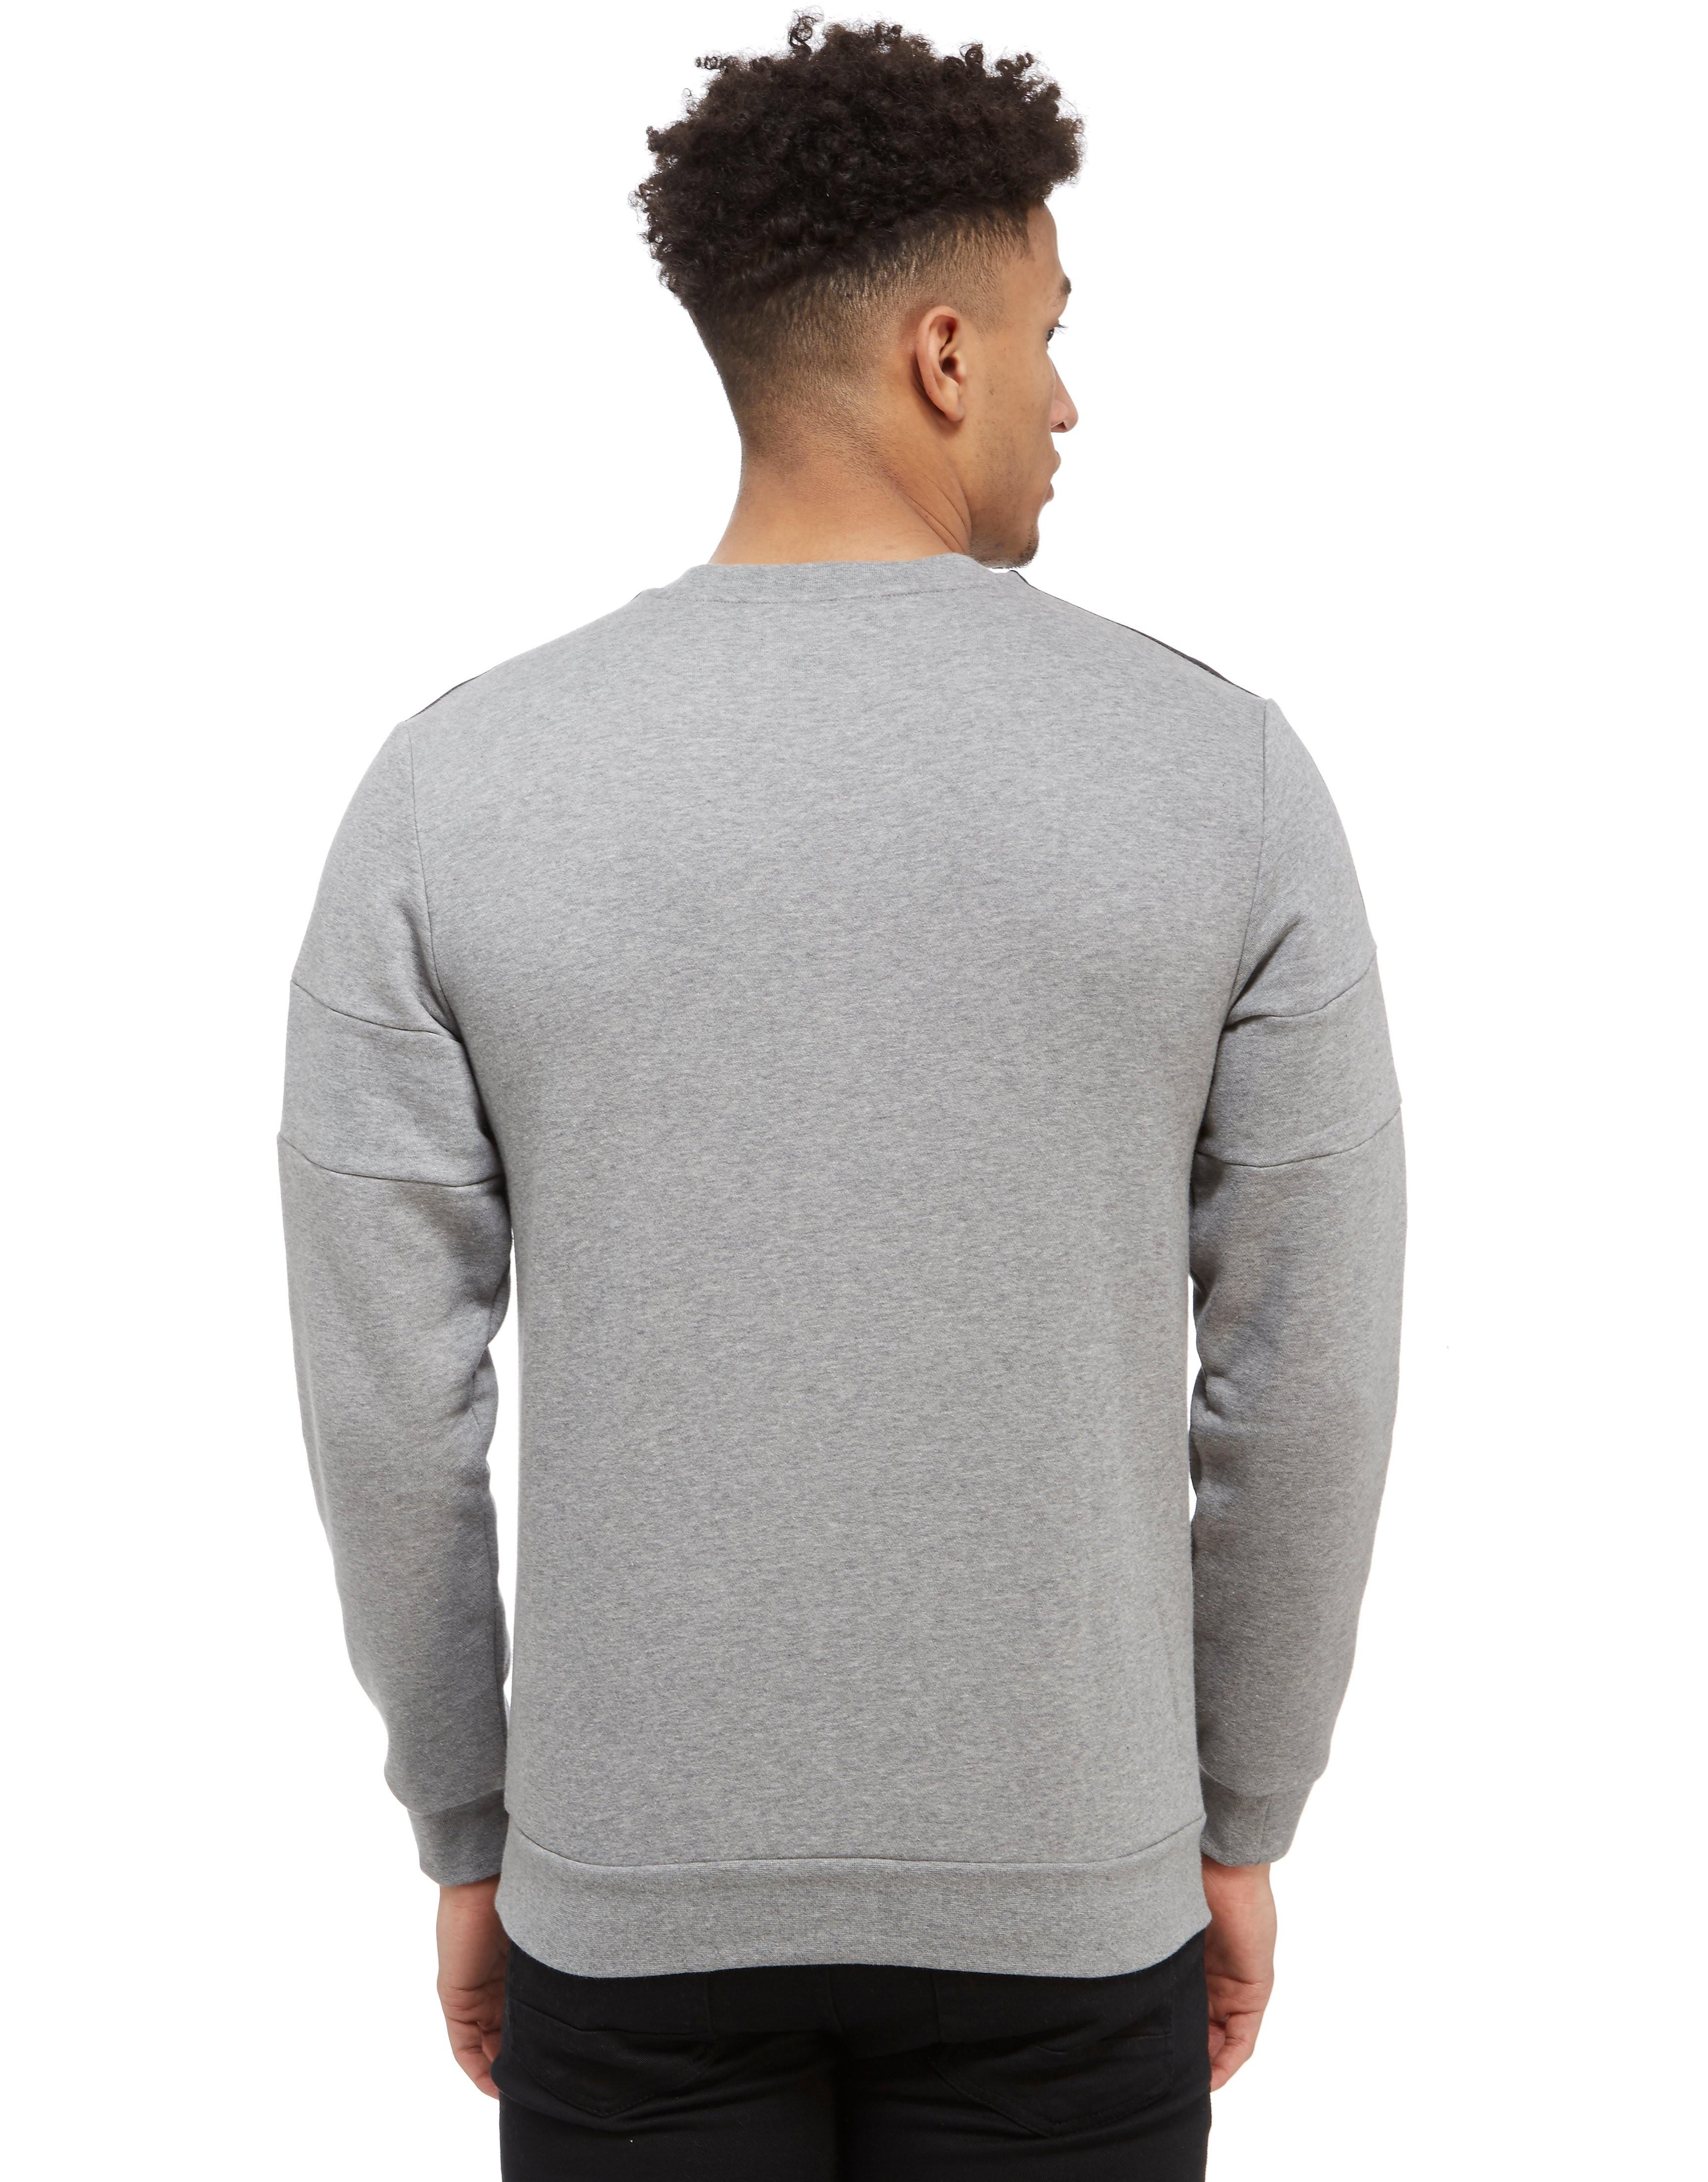 adidas Originals Street Running Pocket Sweatshirt